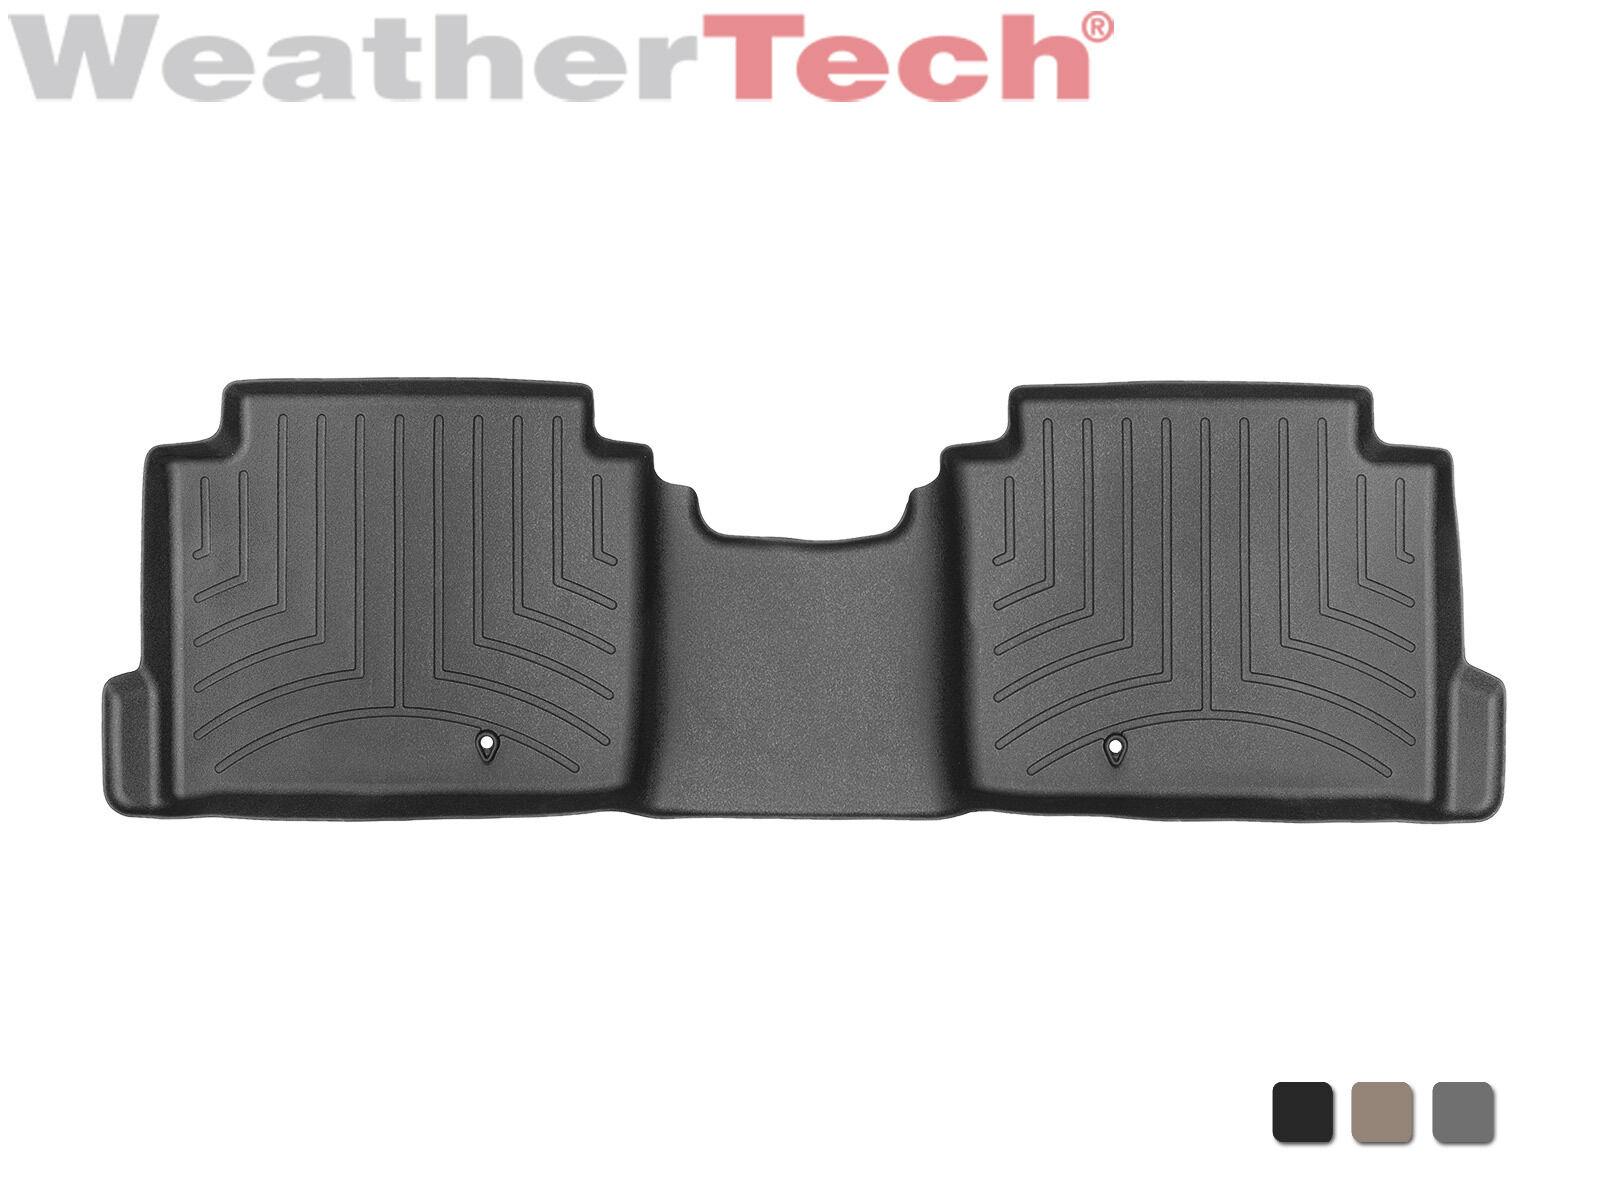 Weathertech Floor Mats Floorliner For Hyundai Elantra 2017 2019 2nd